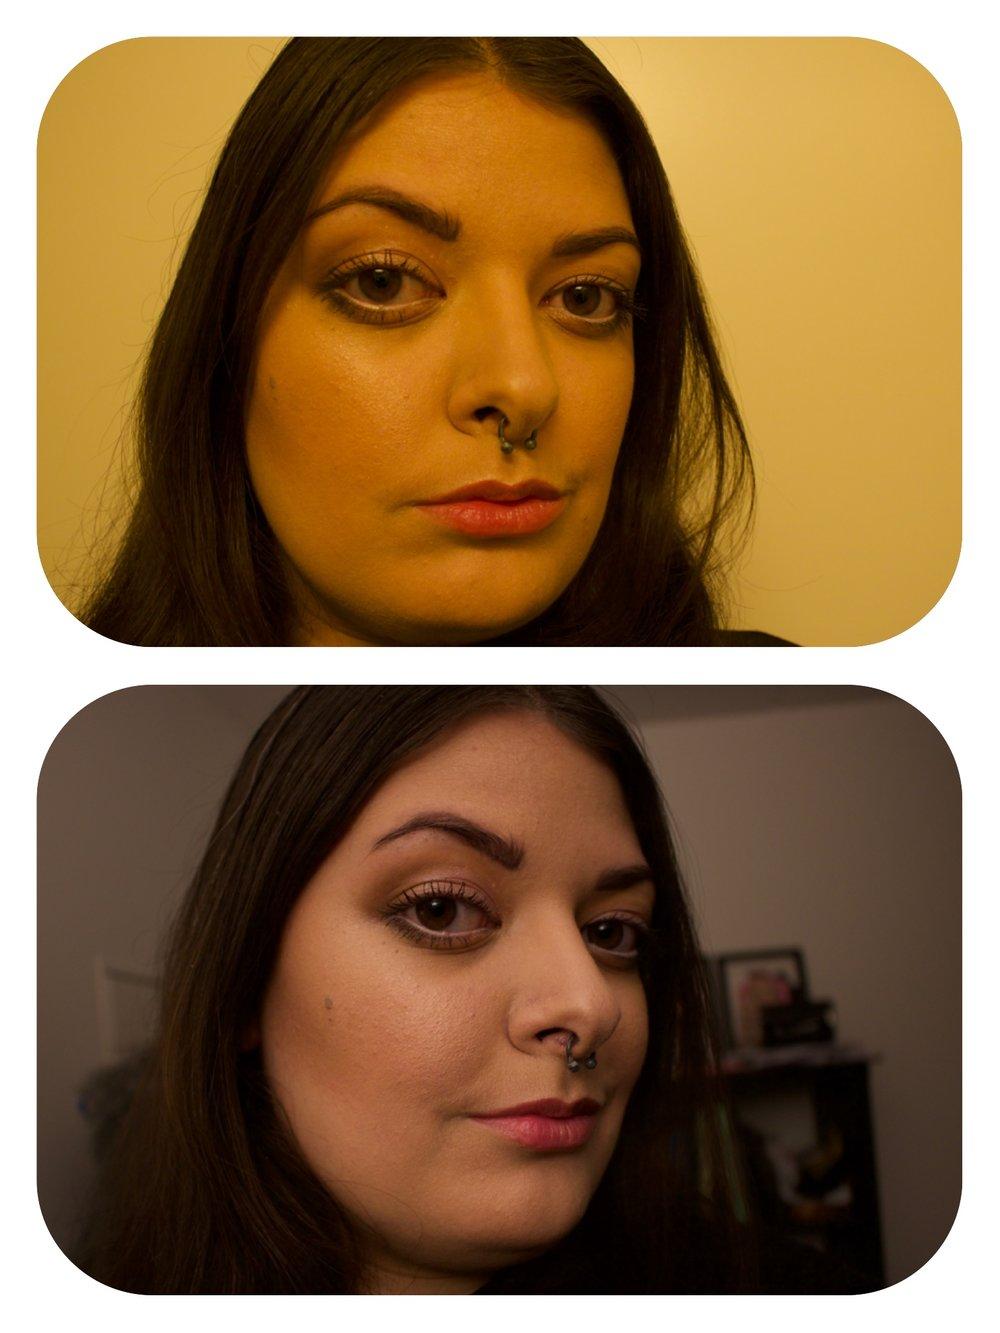 Same makeup different light!